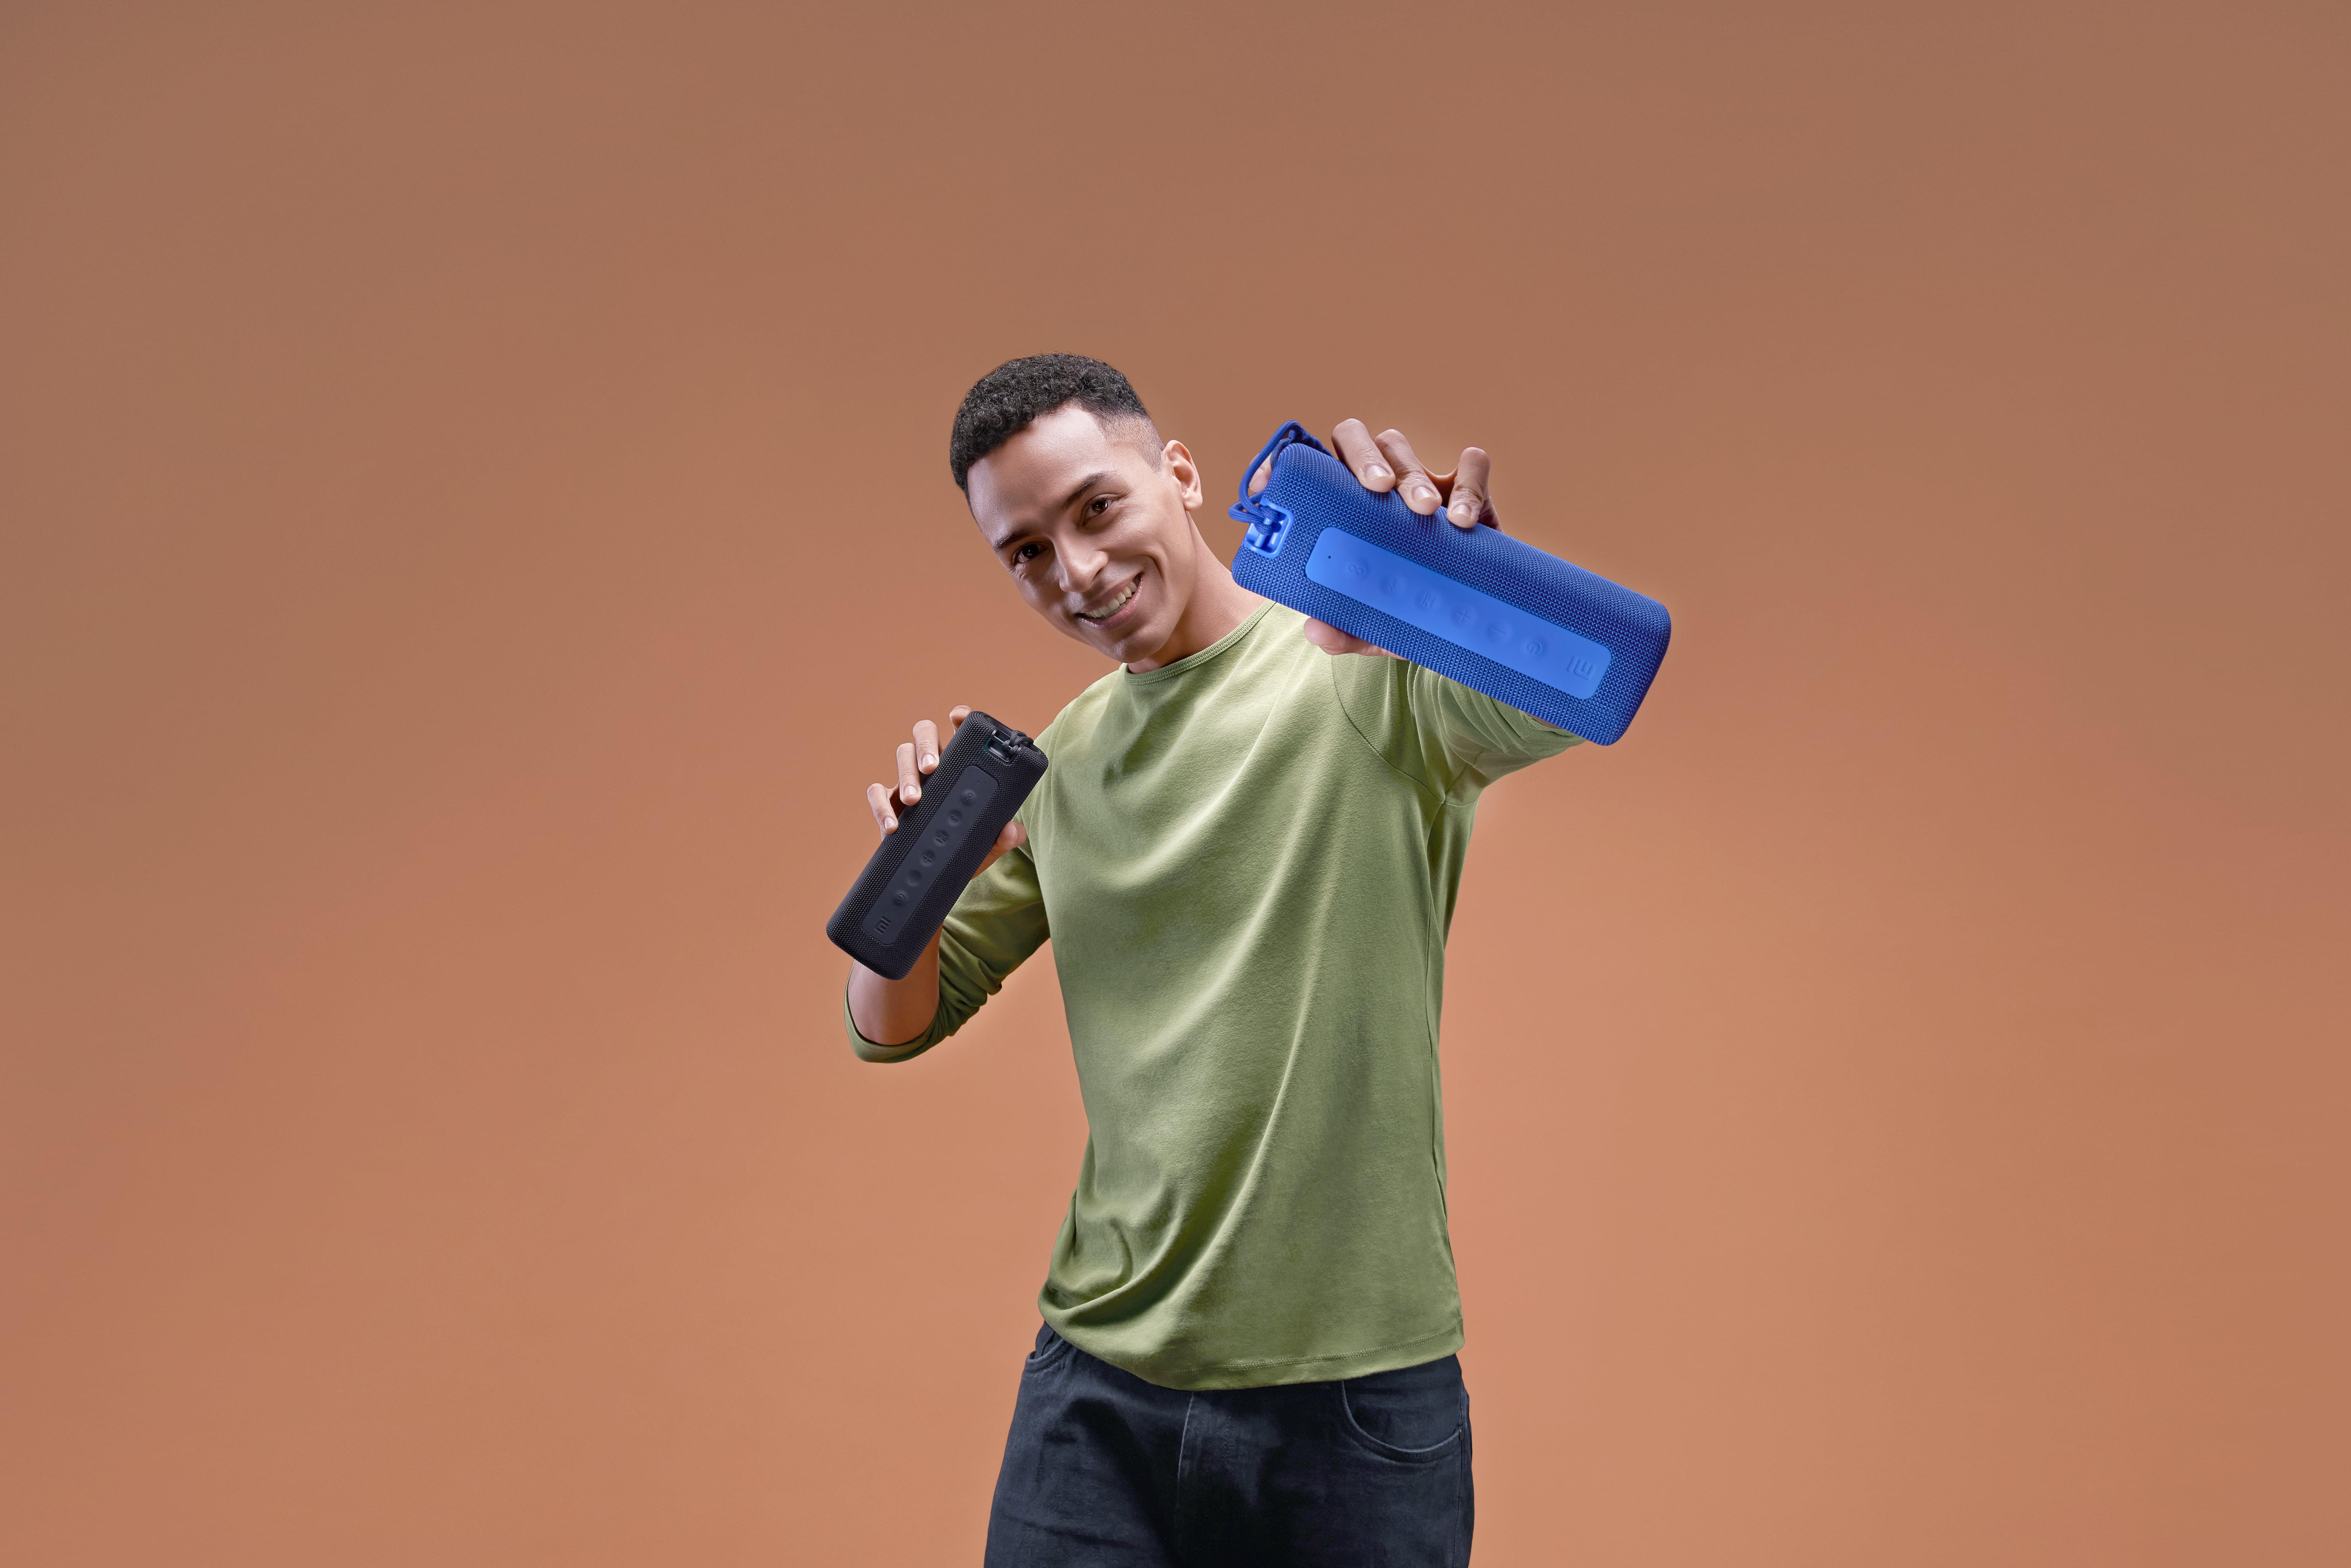 Man with Mi Portable Bluetooth Speaker 16W